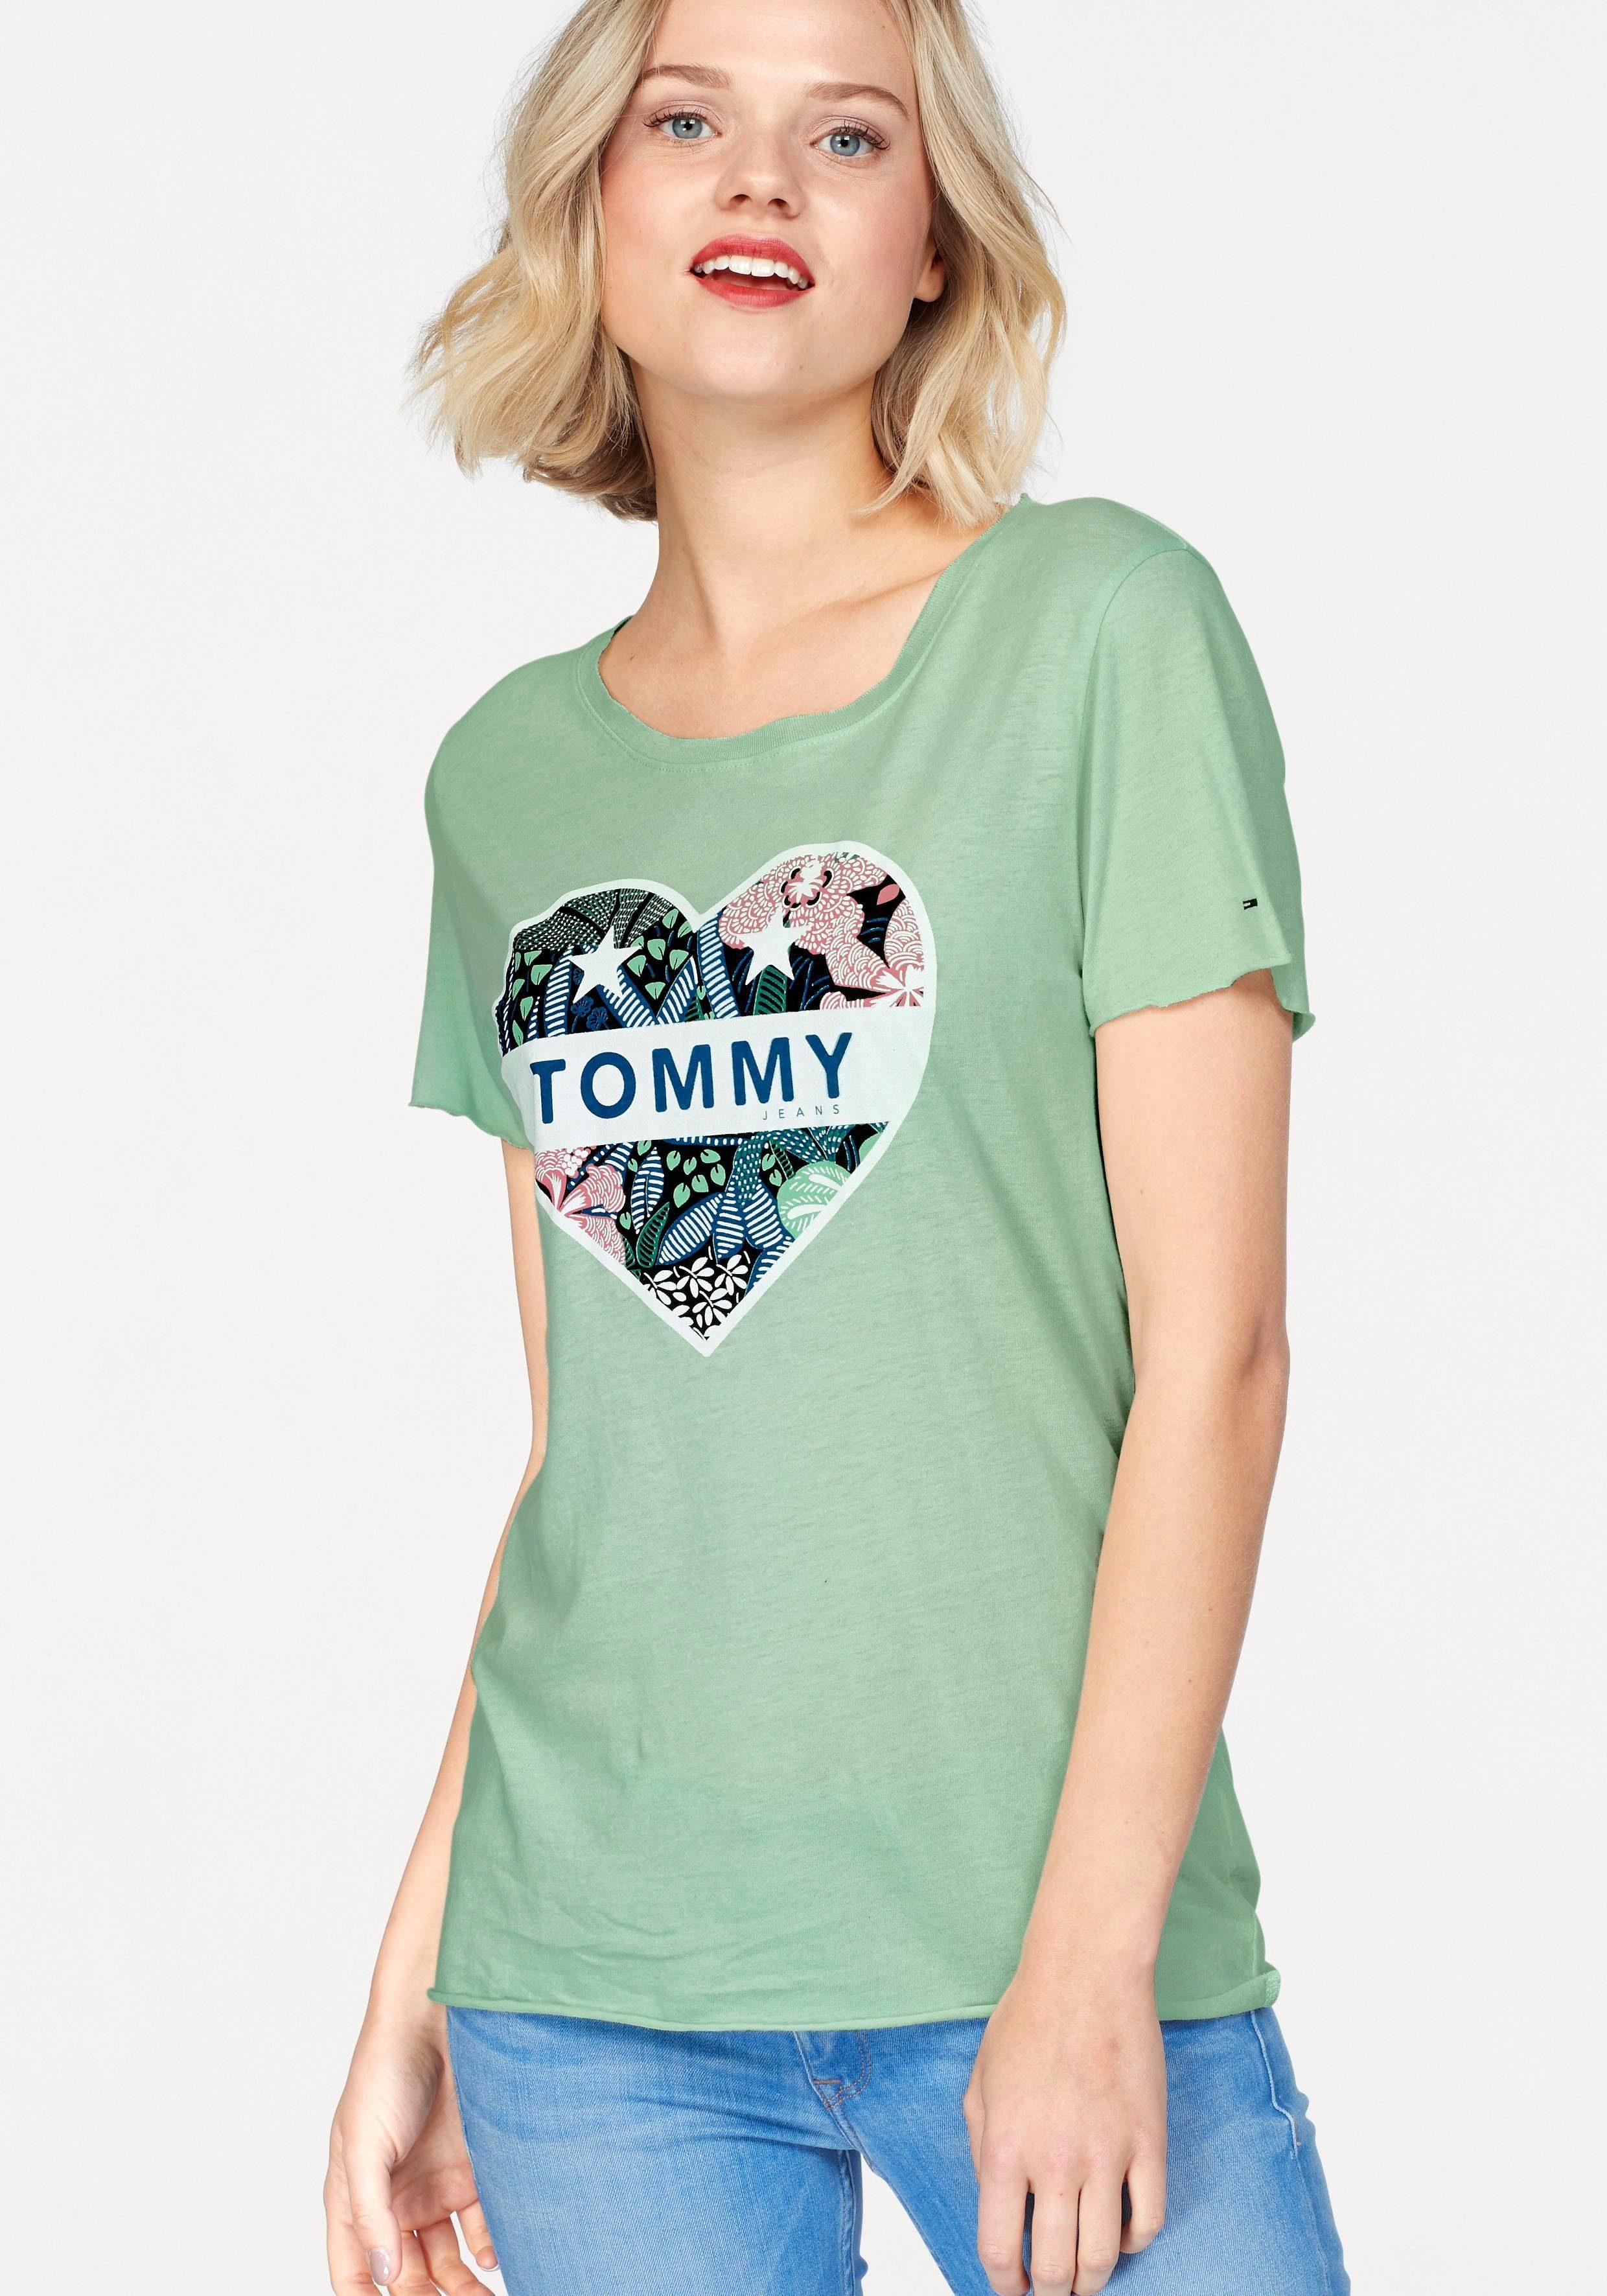 TOMMY JEANS T-Shirt, mit herzförmigem Frontprint  mint